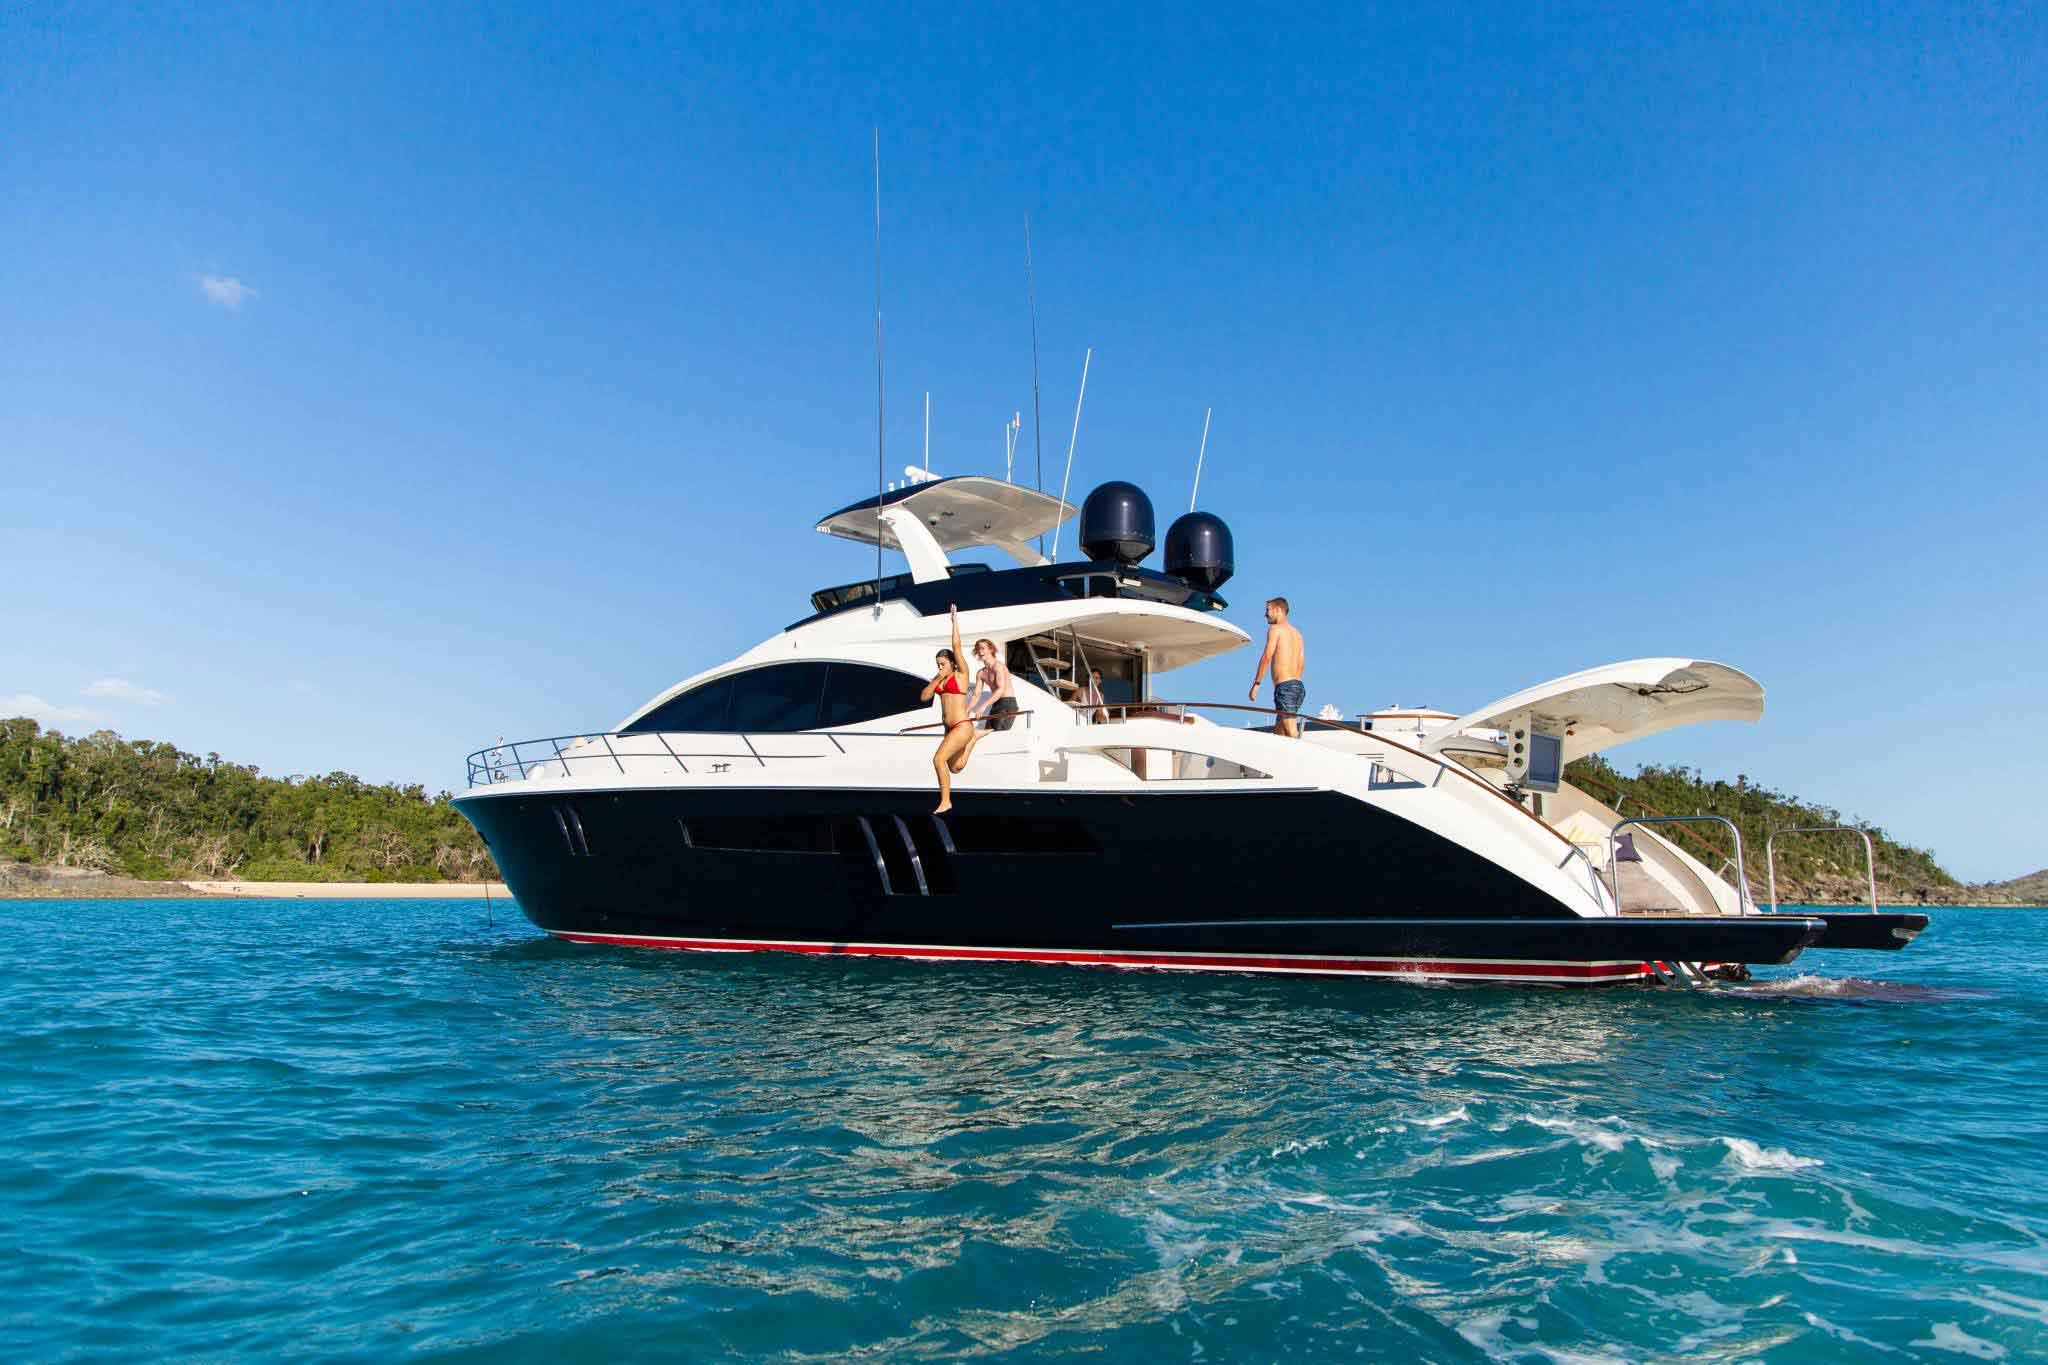 Awol Luxury Charter boat